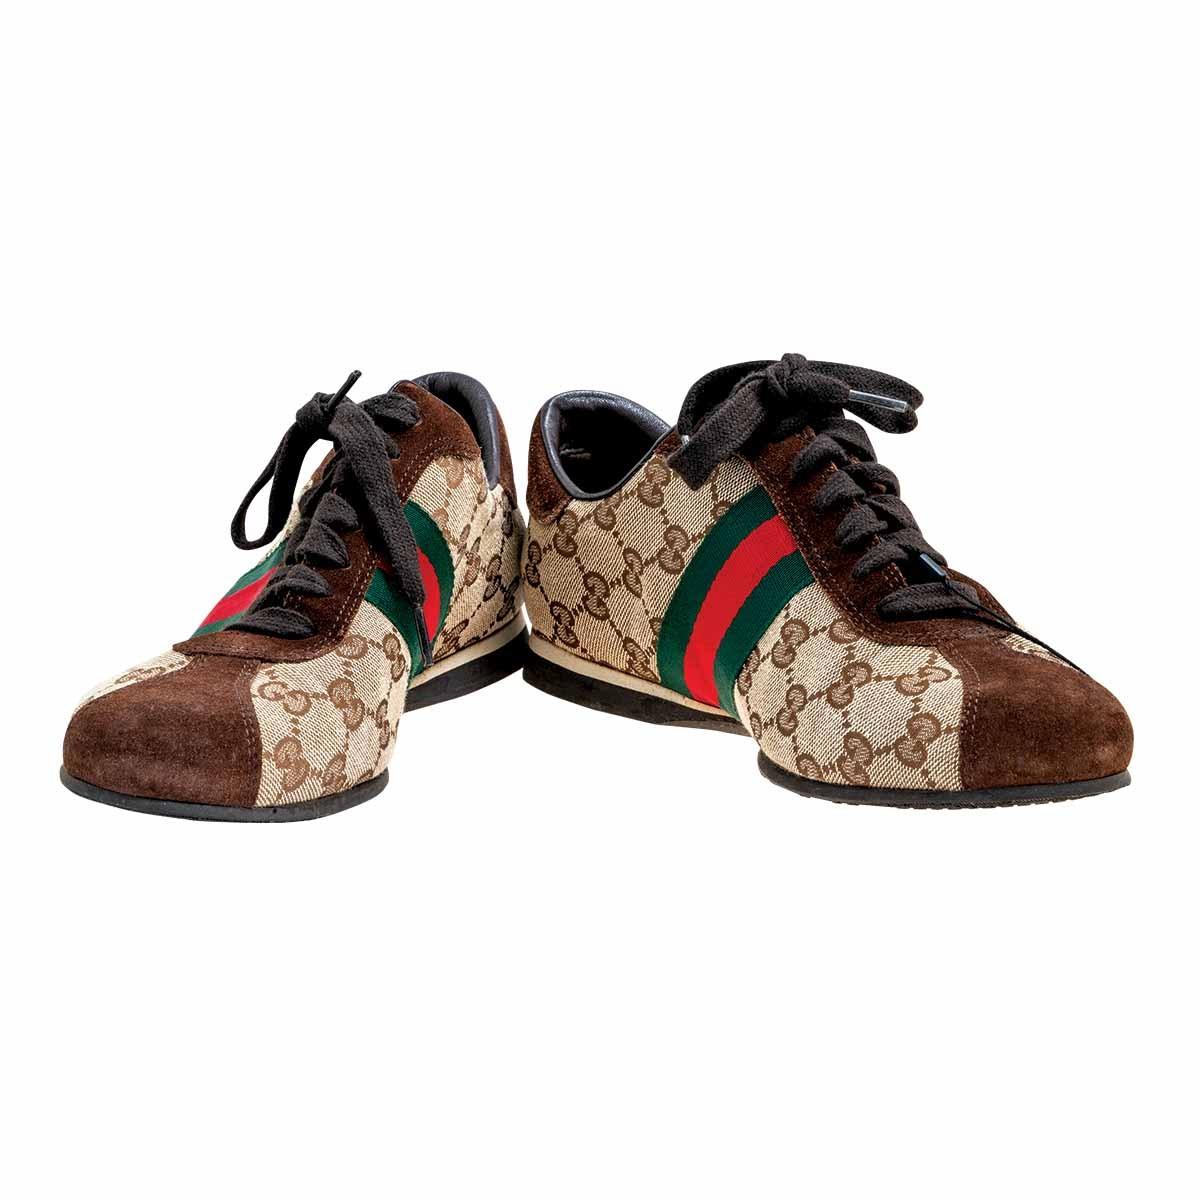 Vintage Gucci Guccissima Sneakers